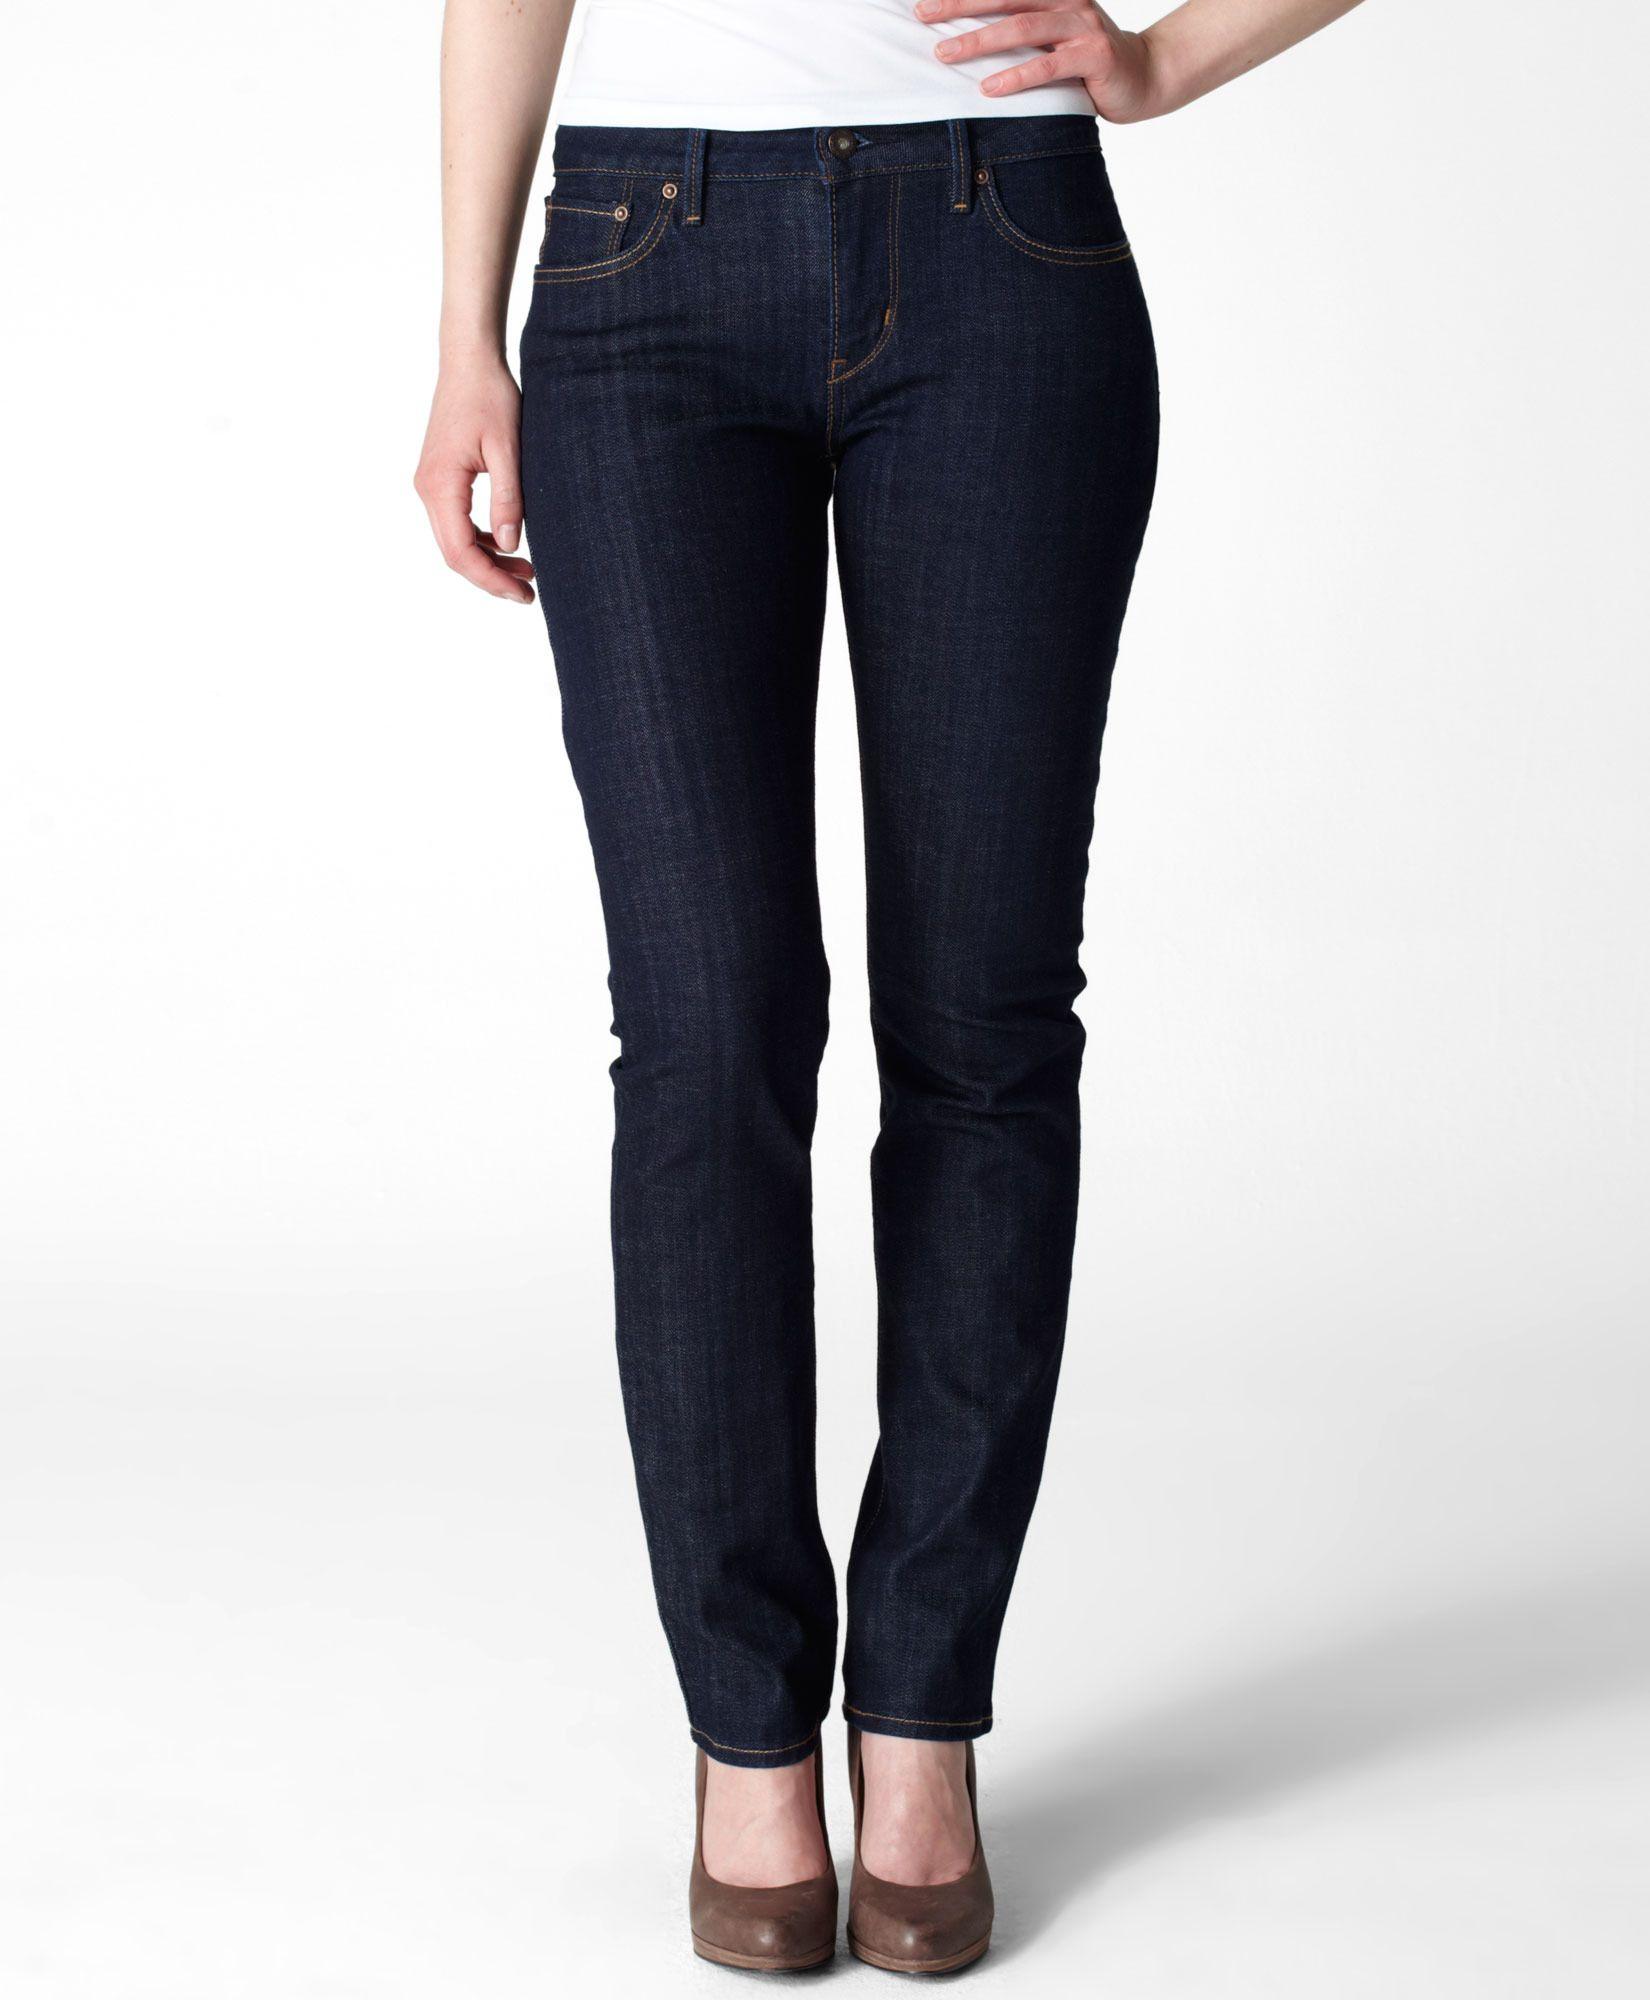 Slim On Right Jeans Classic Levi's I'd Target Rock Curve Bold ndYX44xt